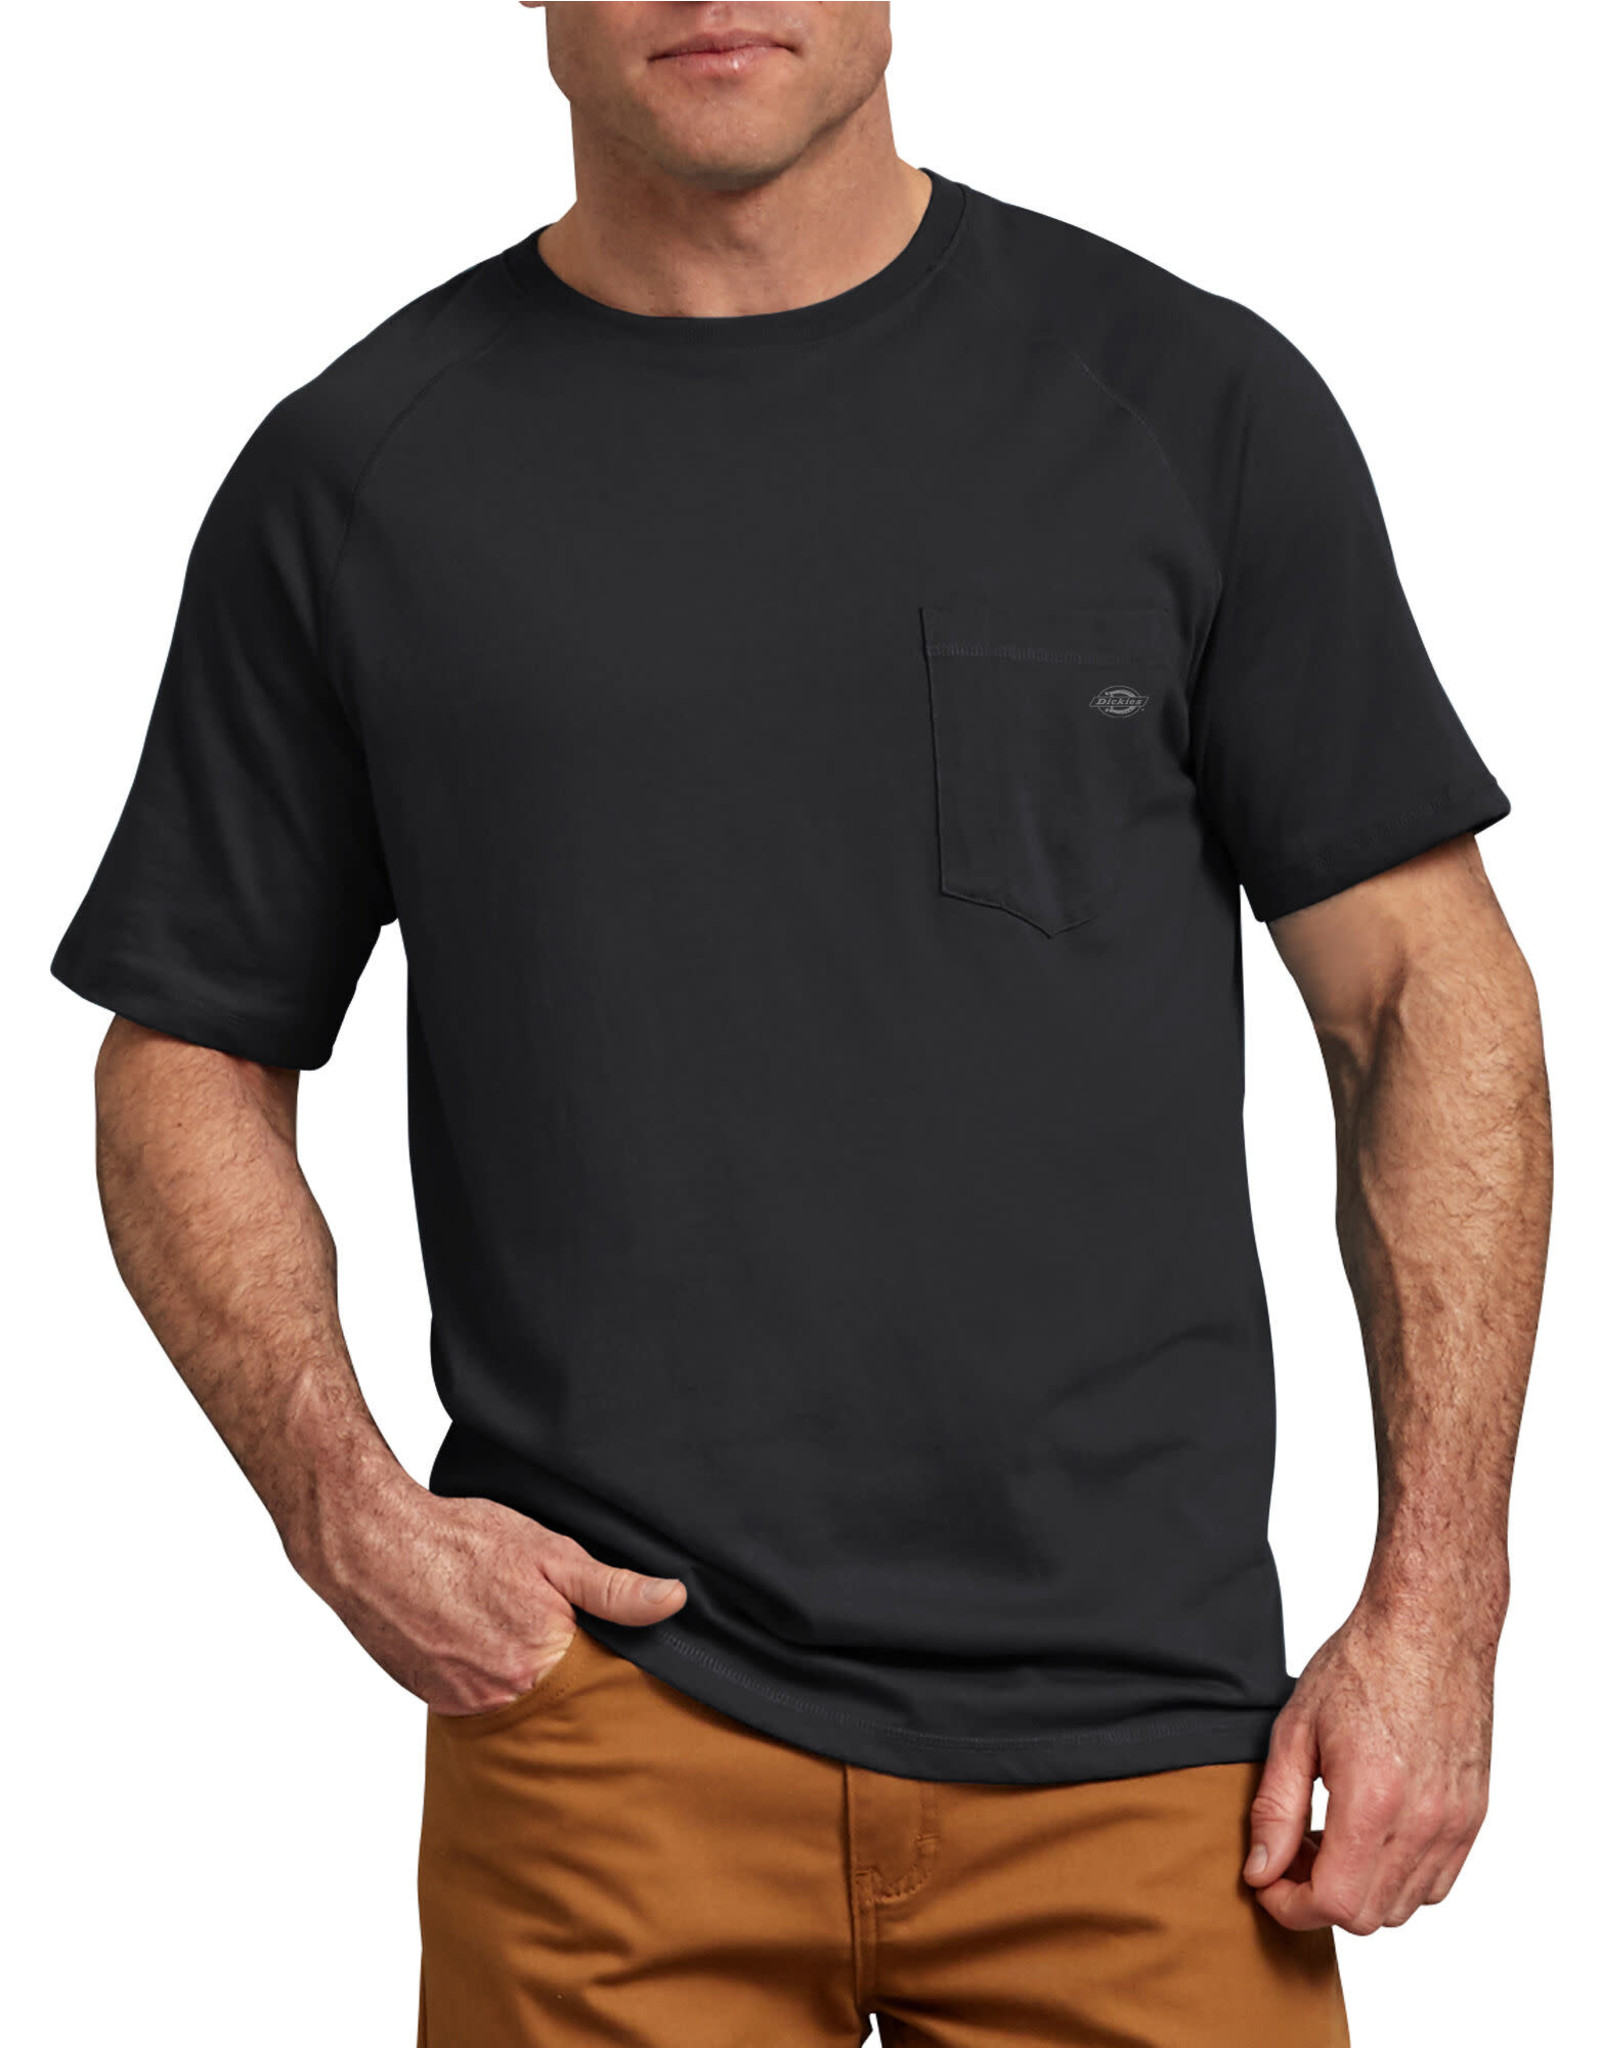 DICKIES Temp-iQ Performance Cooling T-Shirt